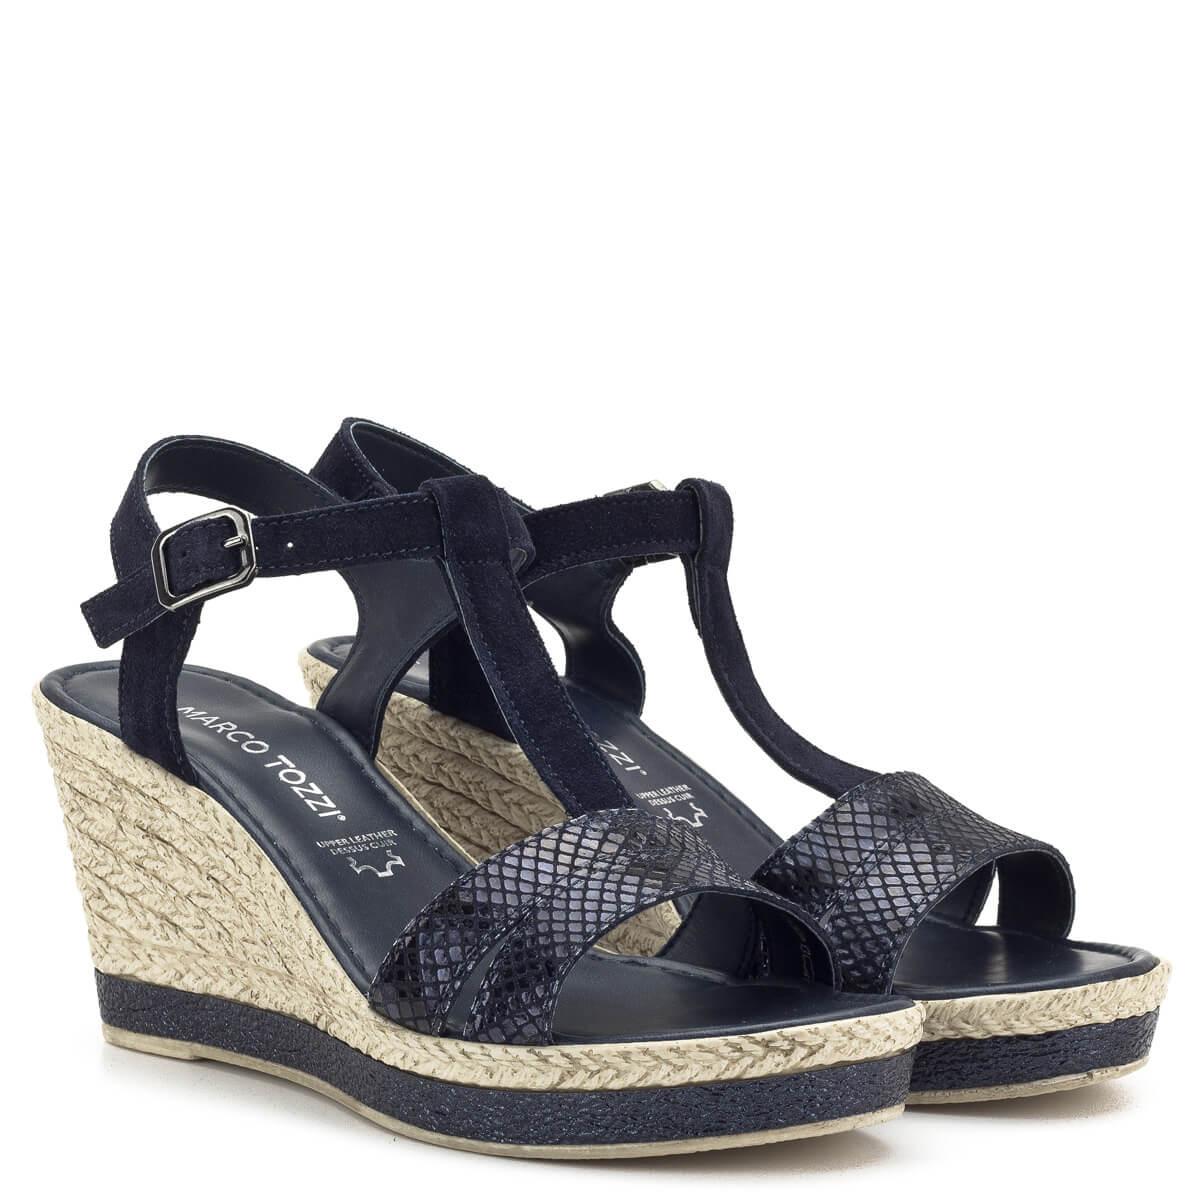 a5f0507322c7 Marco Tozzi cipő webshop - A legújabb Marco Tozzi cipők online - chix.hu